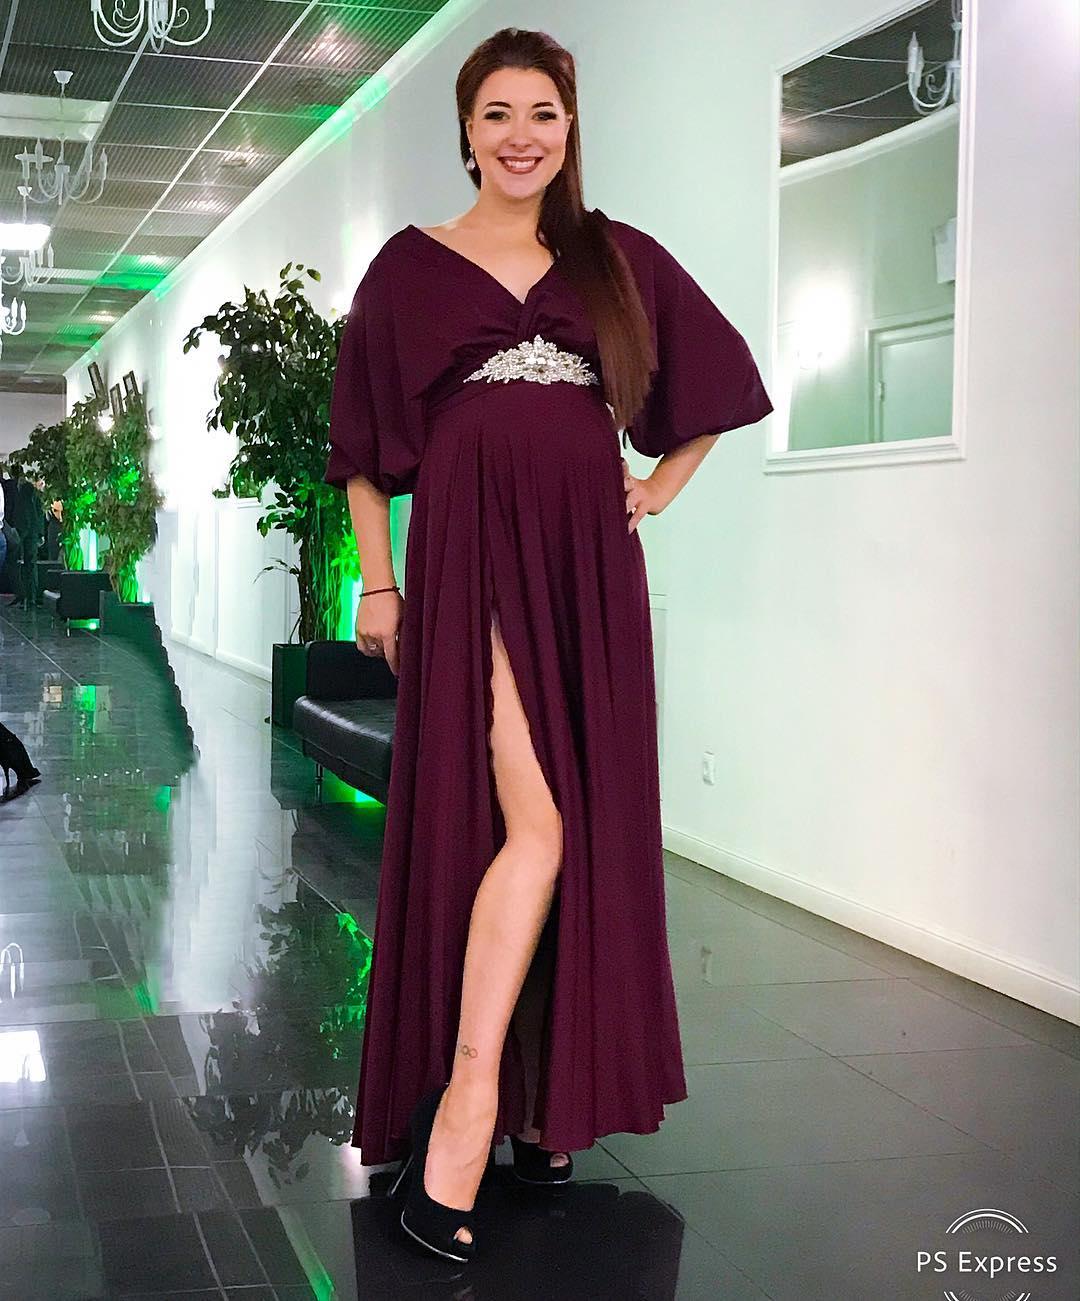 Екатерина Боброва - Дмитрий Соловьев - 2 - Страница 43 JtT_rz58Wek